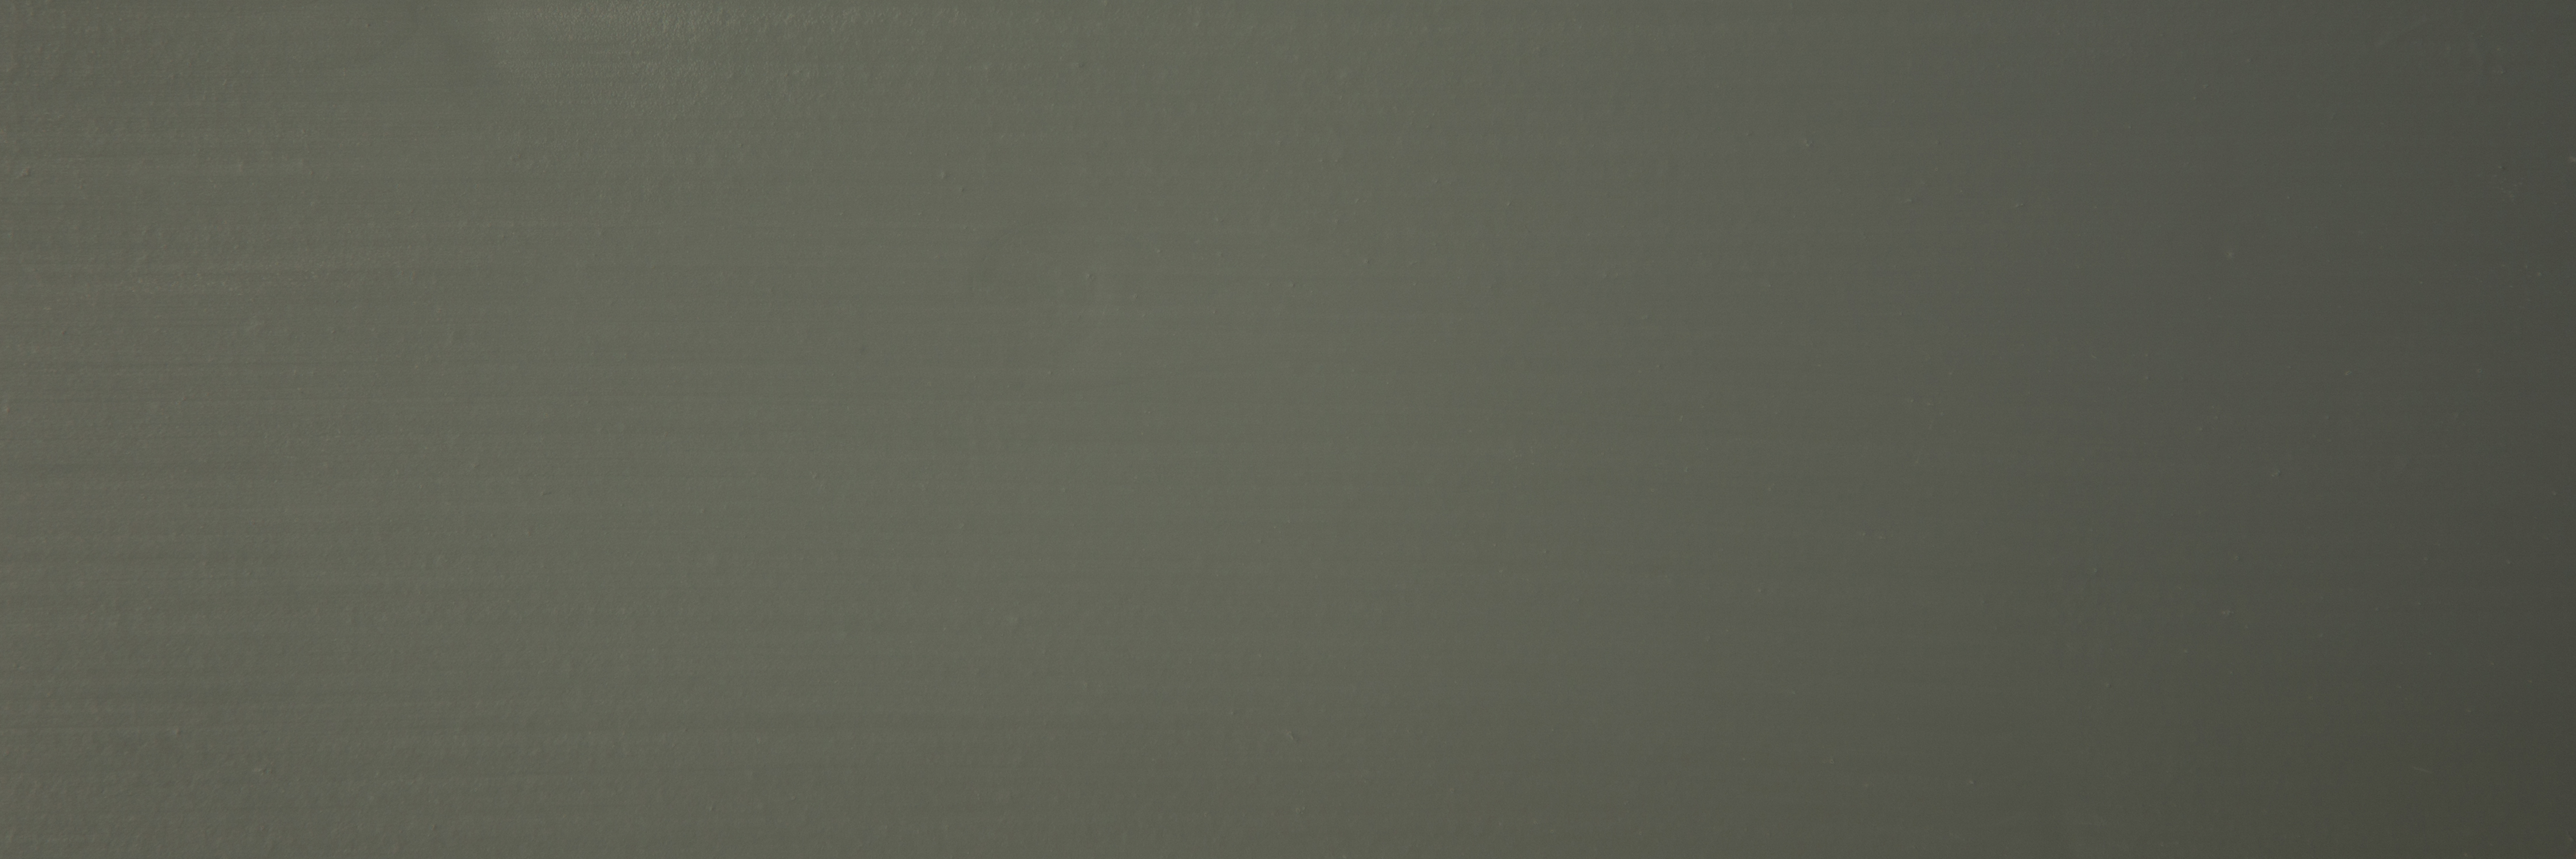 NCL-10 | Basalt grey